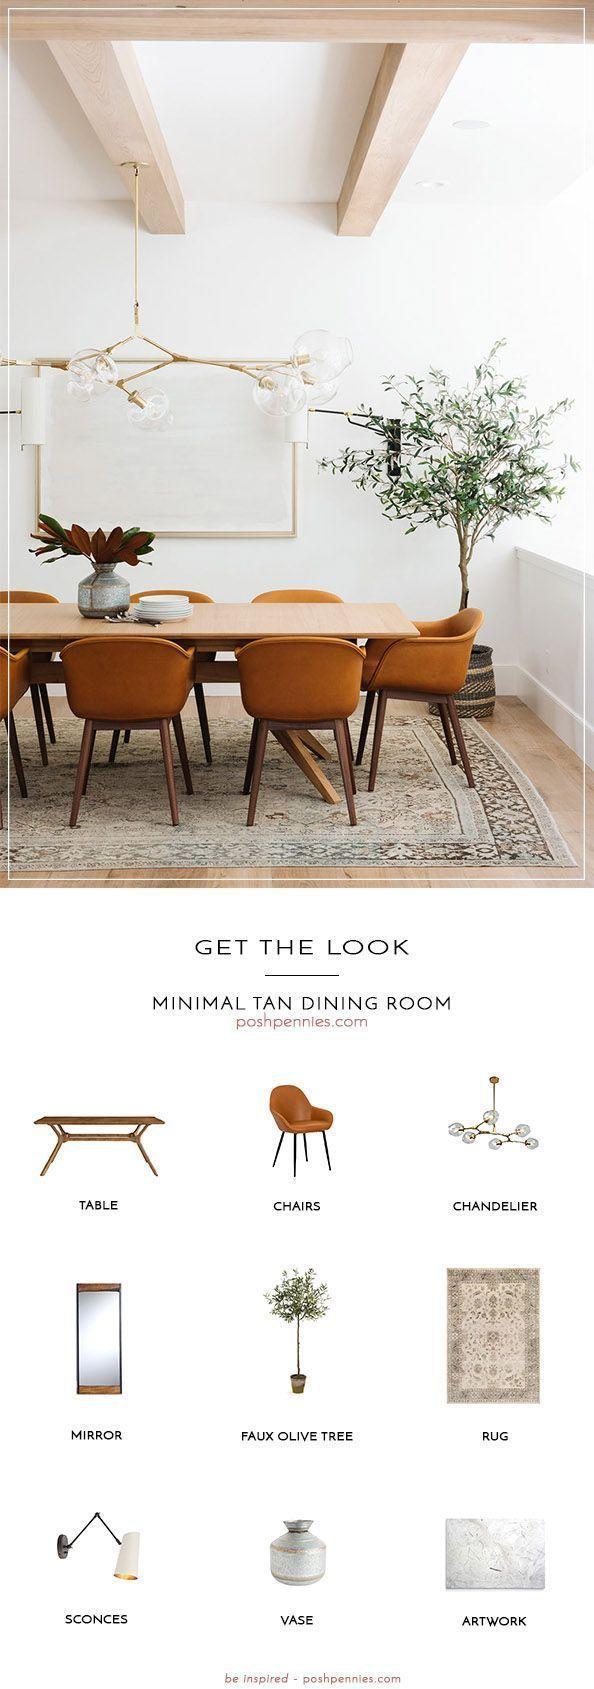 Photo of Incredible Dining Room Design Ideas. Find more dining room decor ideas at www.di…,Züleyha Yılmaz Sir